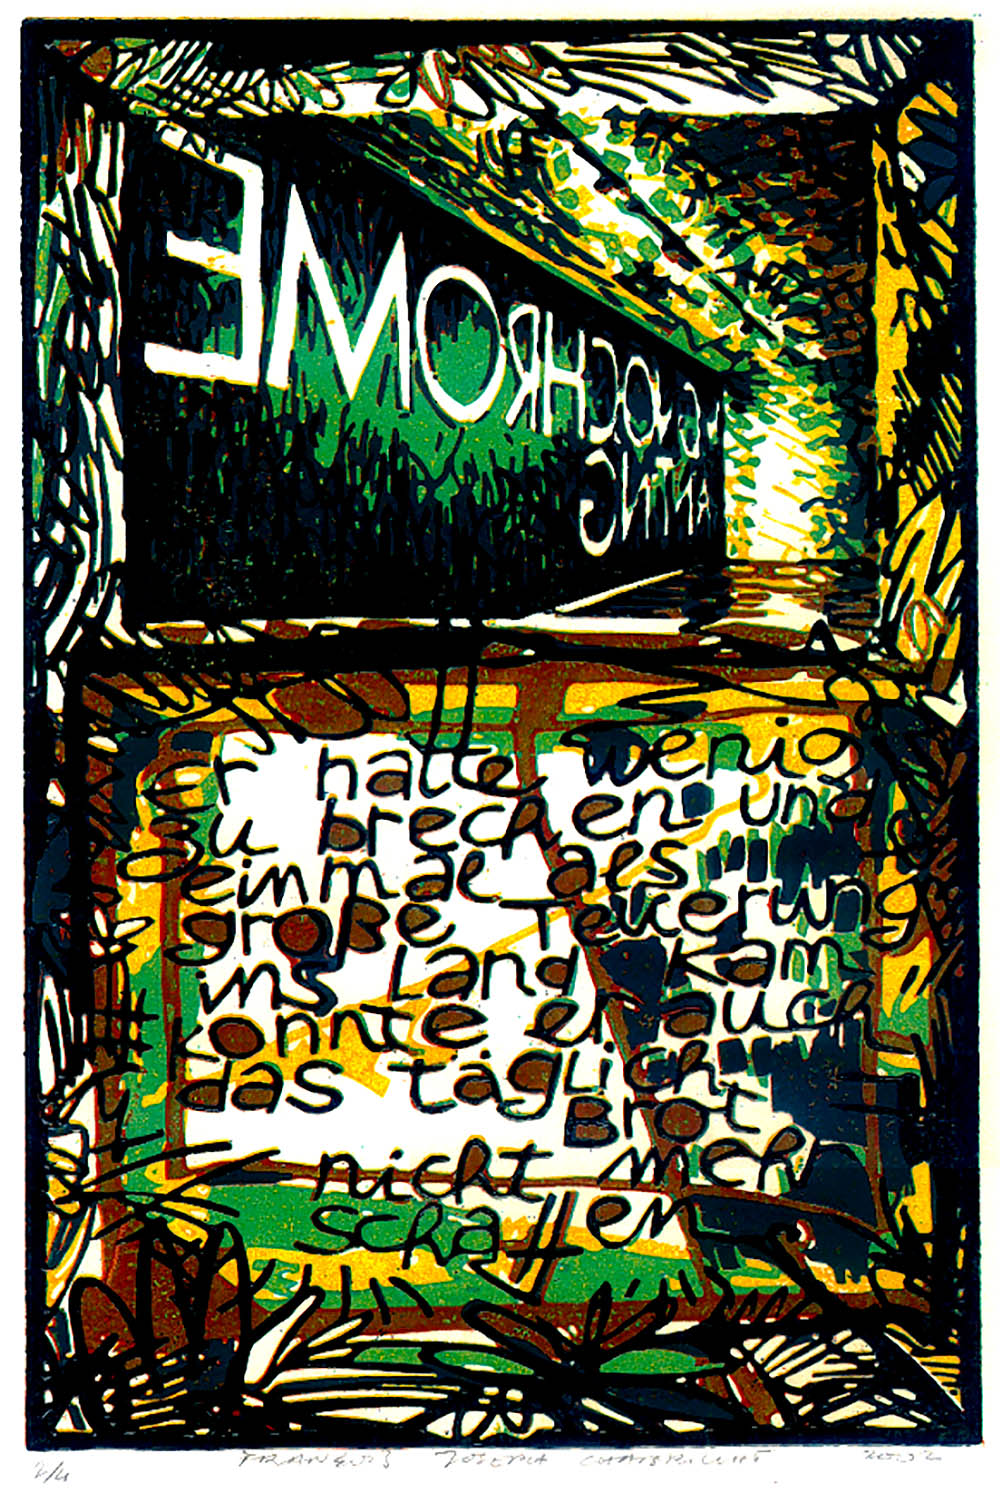 o.T. (Hänsel und Gretel) | 2002 | Farbkartondruck | 33 x 22 cm